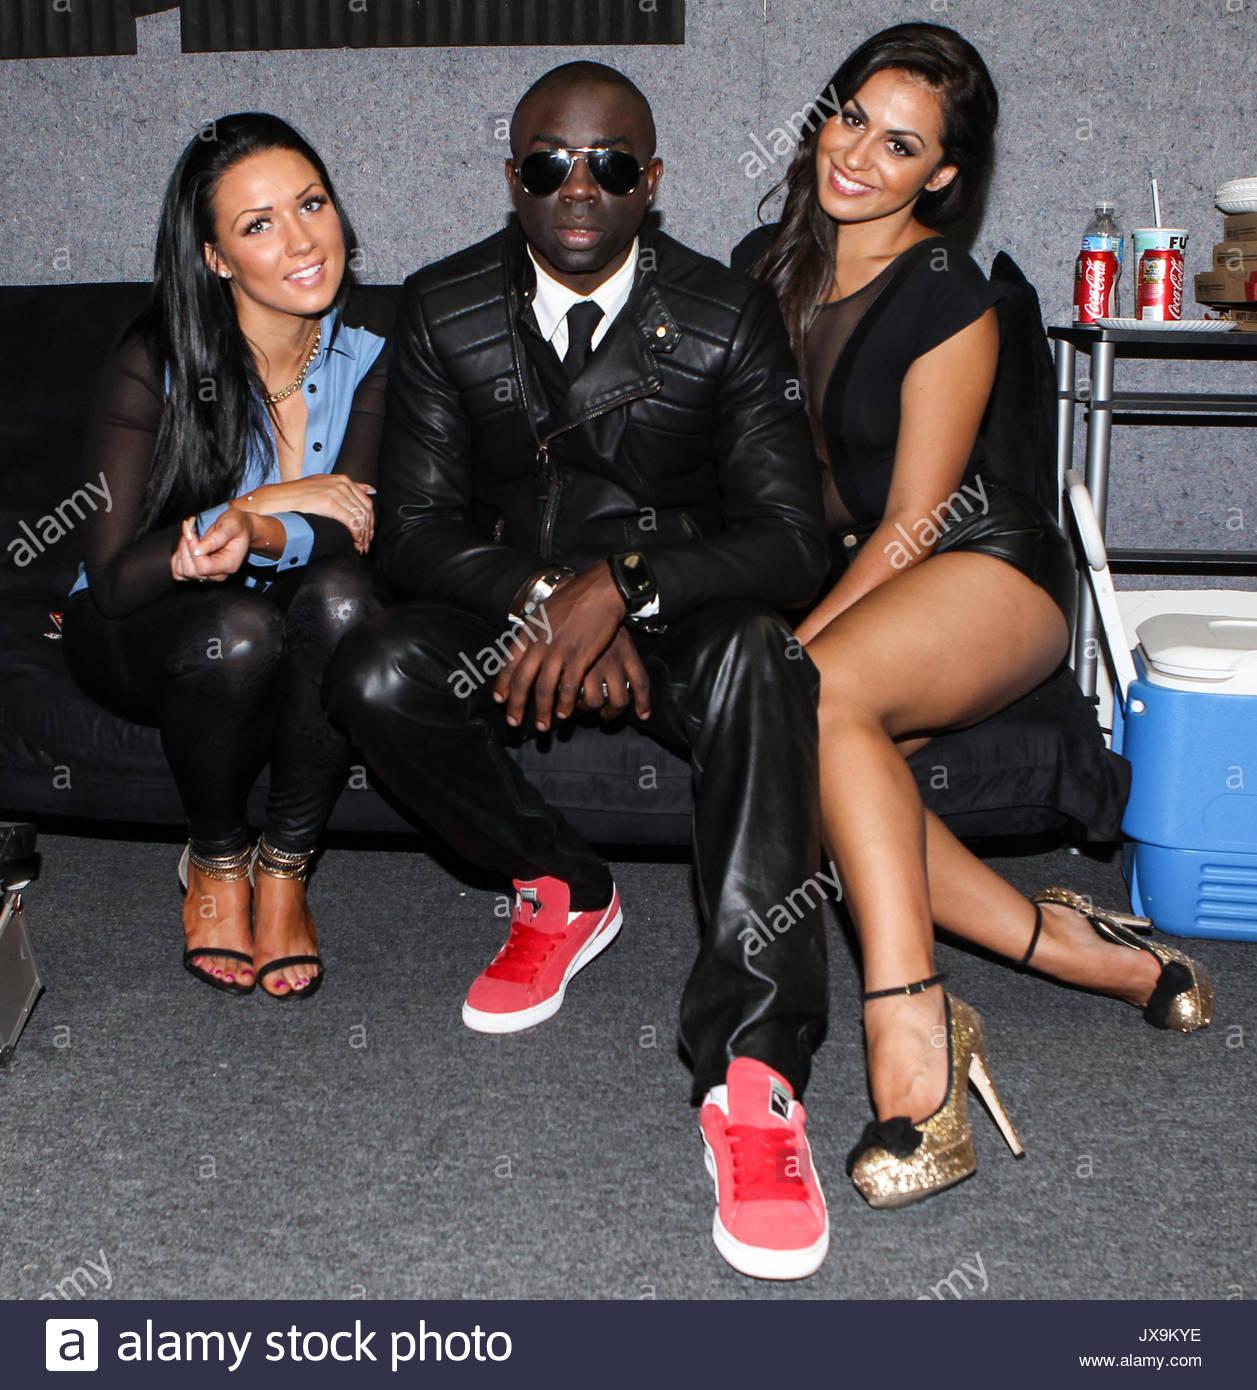 Gigi hadid photoshoot with reebok in new york city new photo